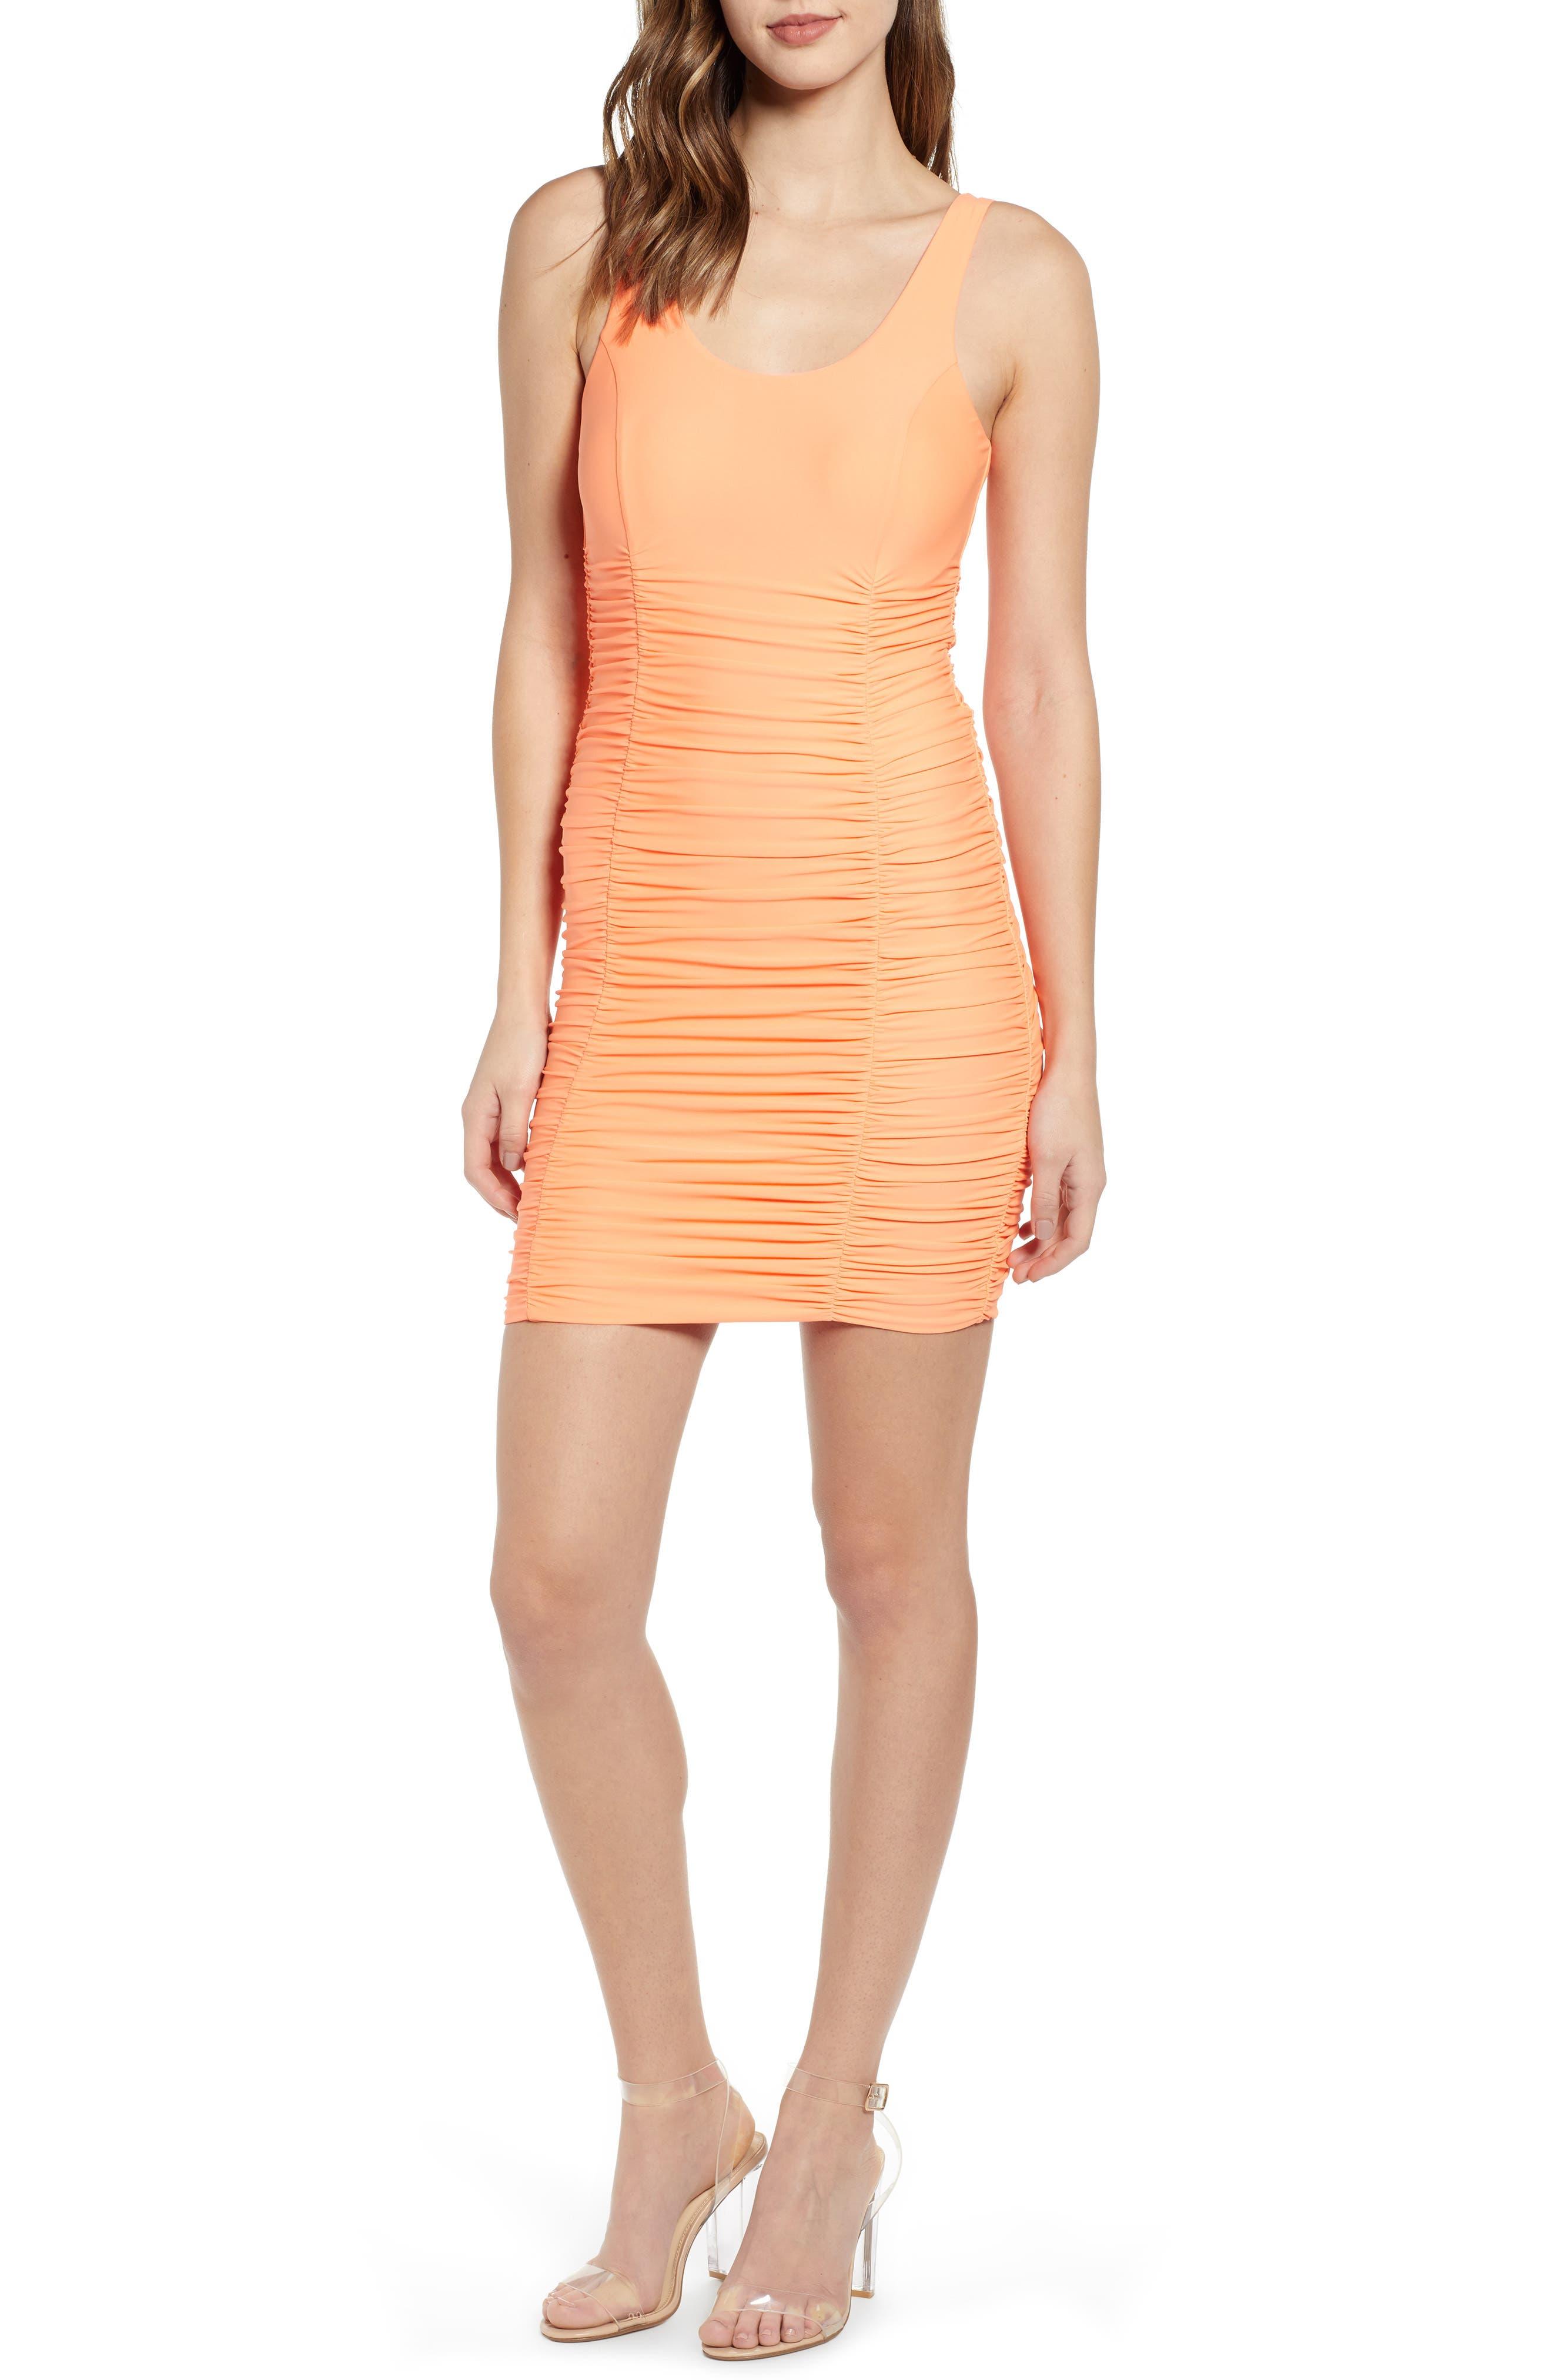 Tiger Mist Santa Clara Body-Con Dress, Orange